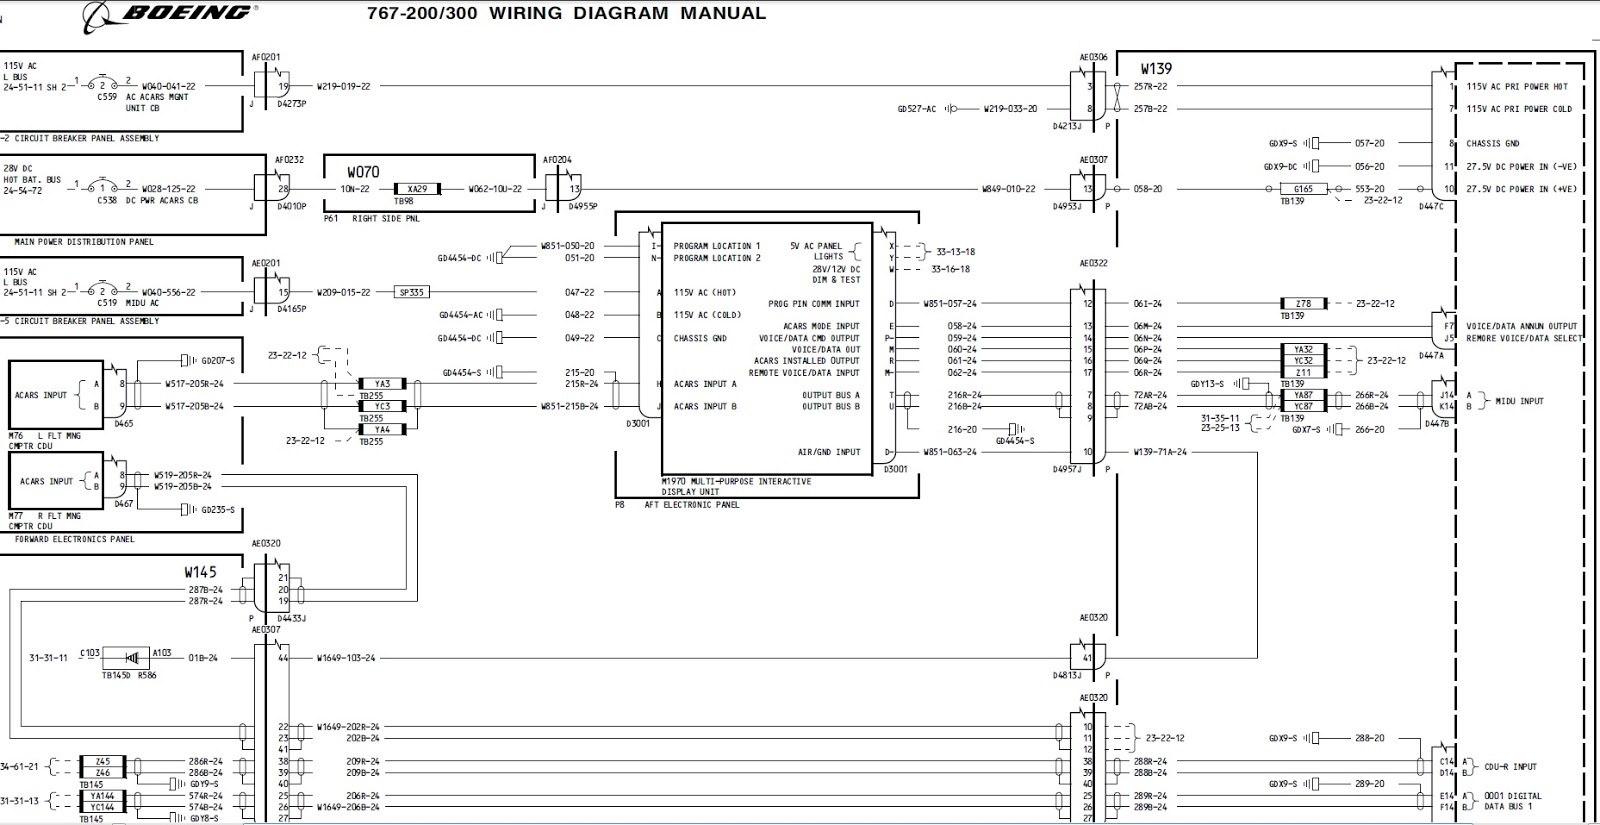 hight resolution of boeing wiring diagram wiring diagram forward boeing wiring diagram manual boeing wiring diagrams